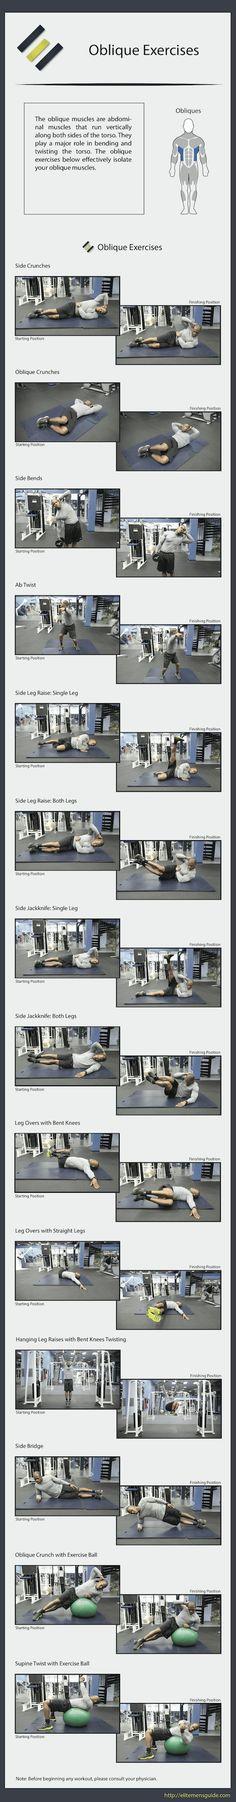 EMG's 14 Oblique Exercises #obliqueexercises